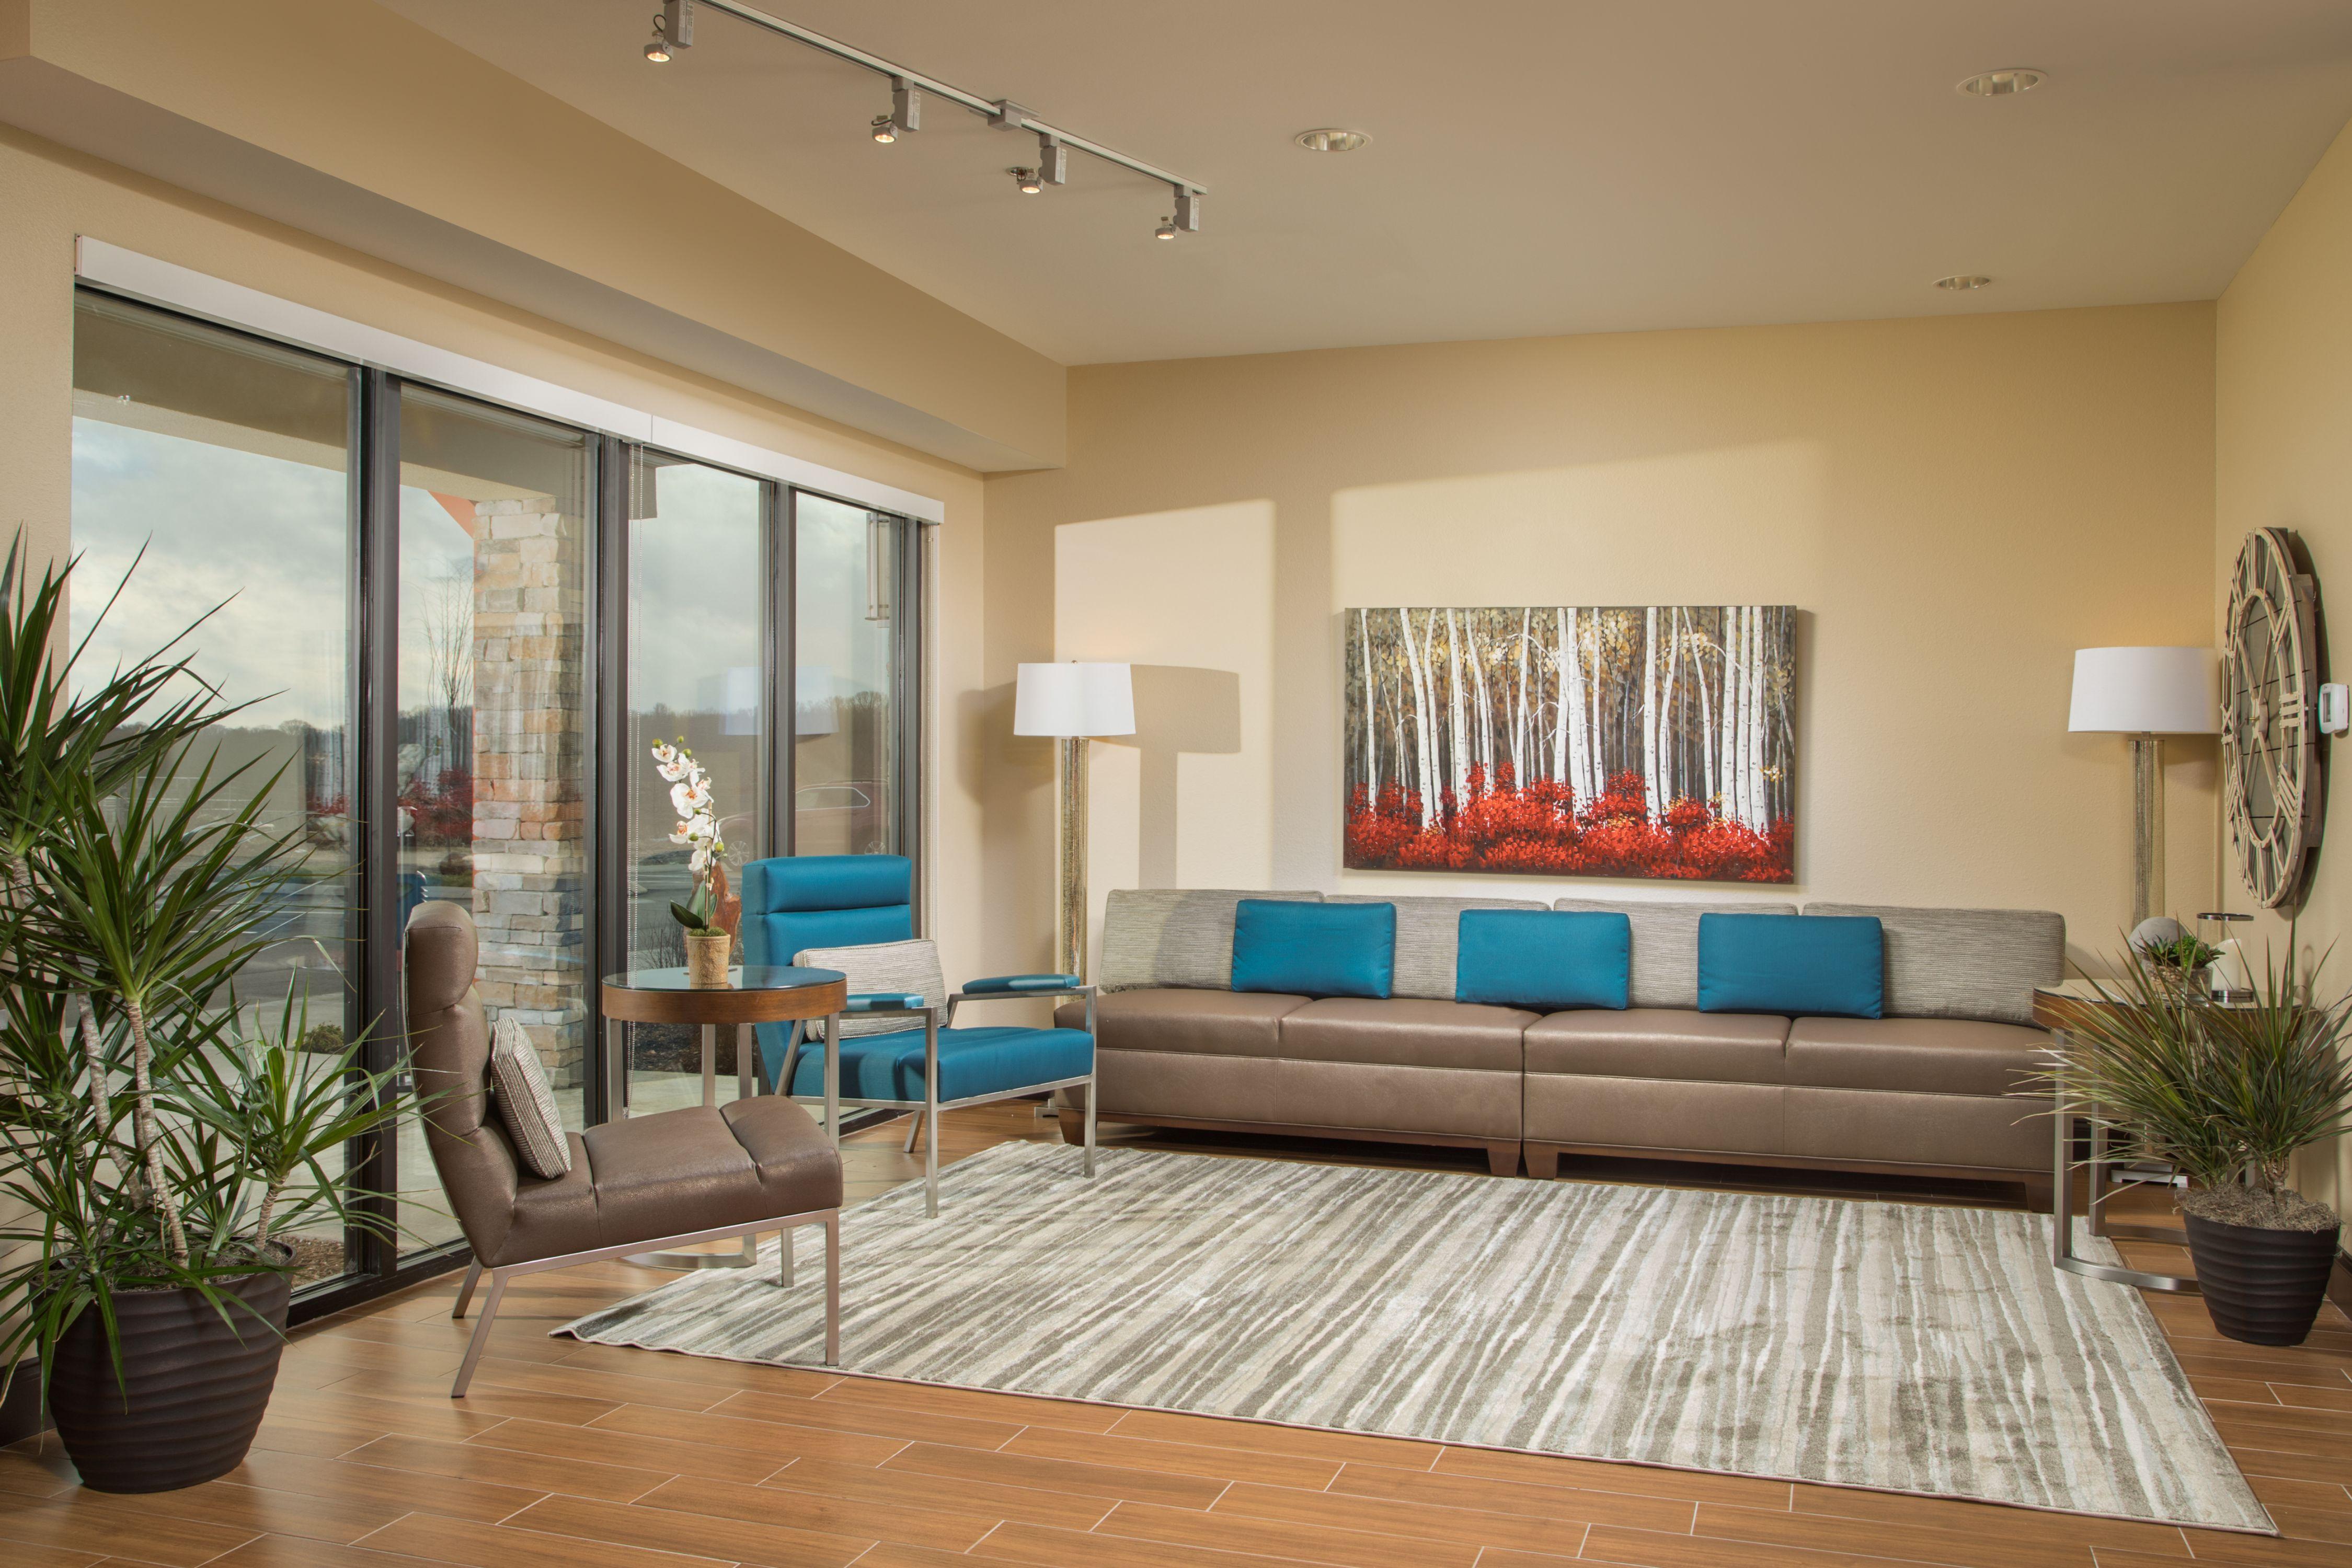 TownePlace Suites by Marriott Nashville Smyrna image 0